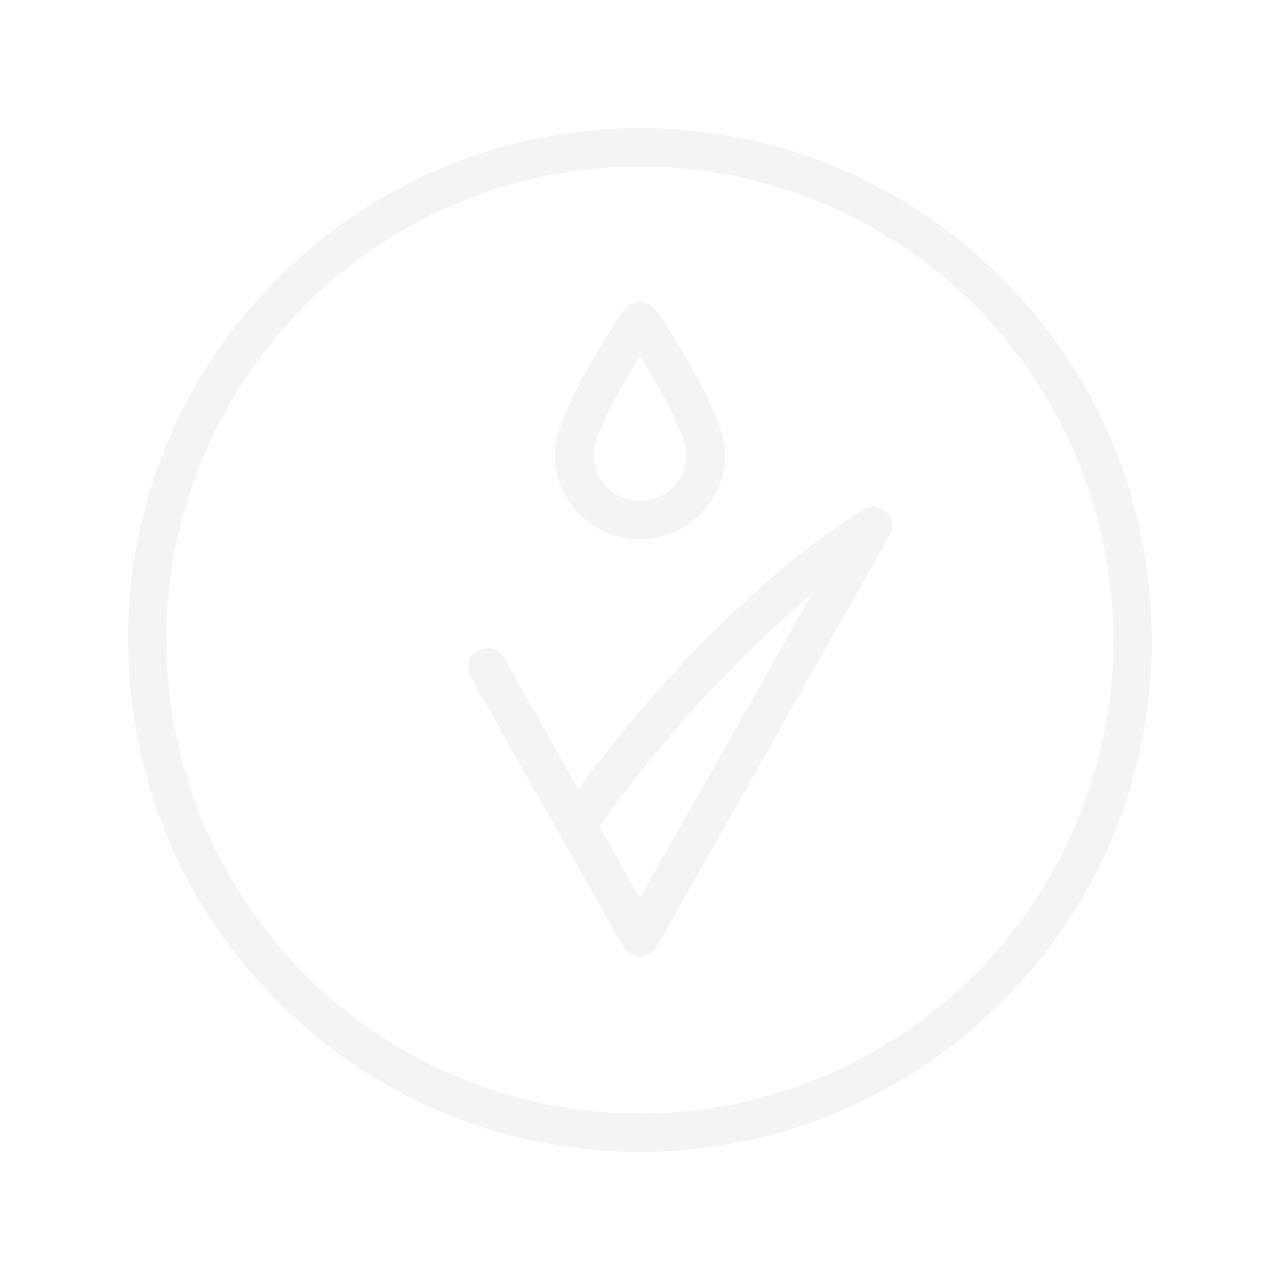 L'OREAL PROFESSIONNEL Blondifier Top Coat Spray 150ml